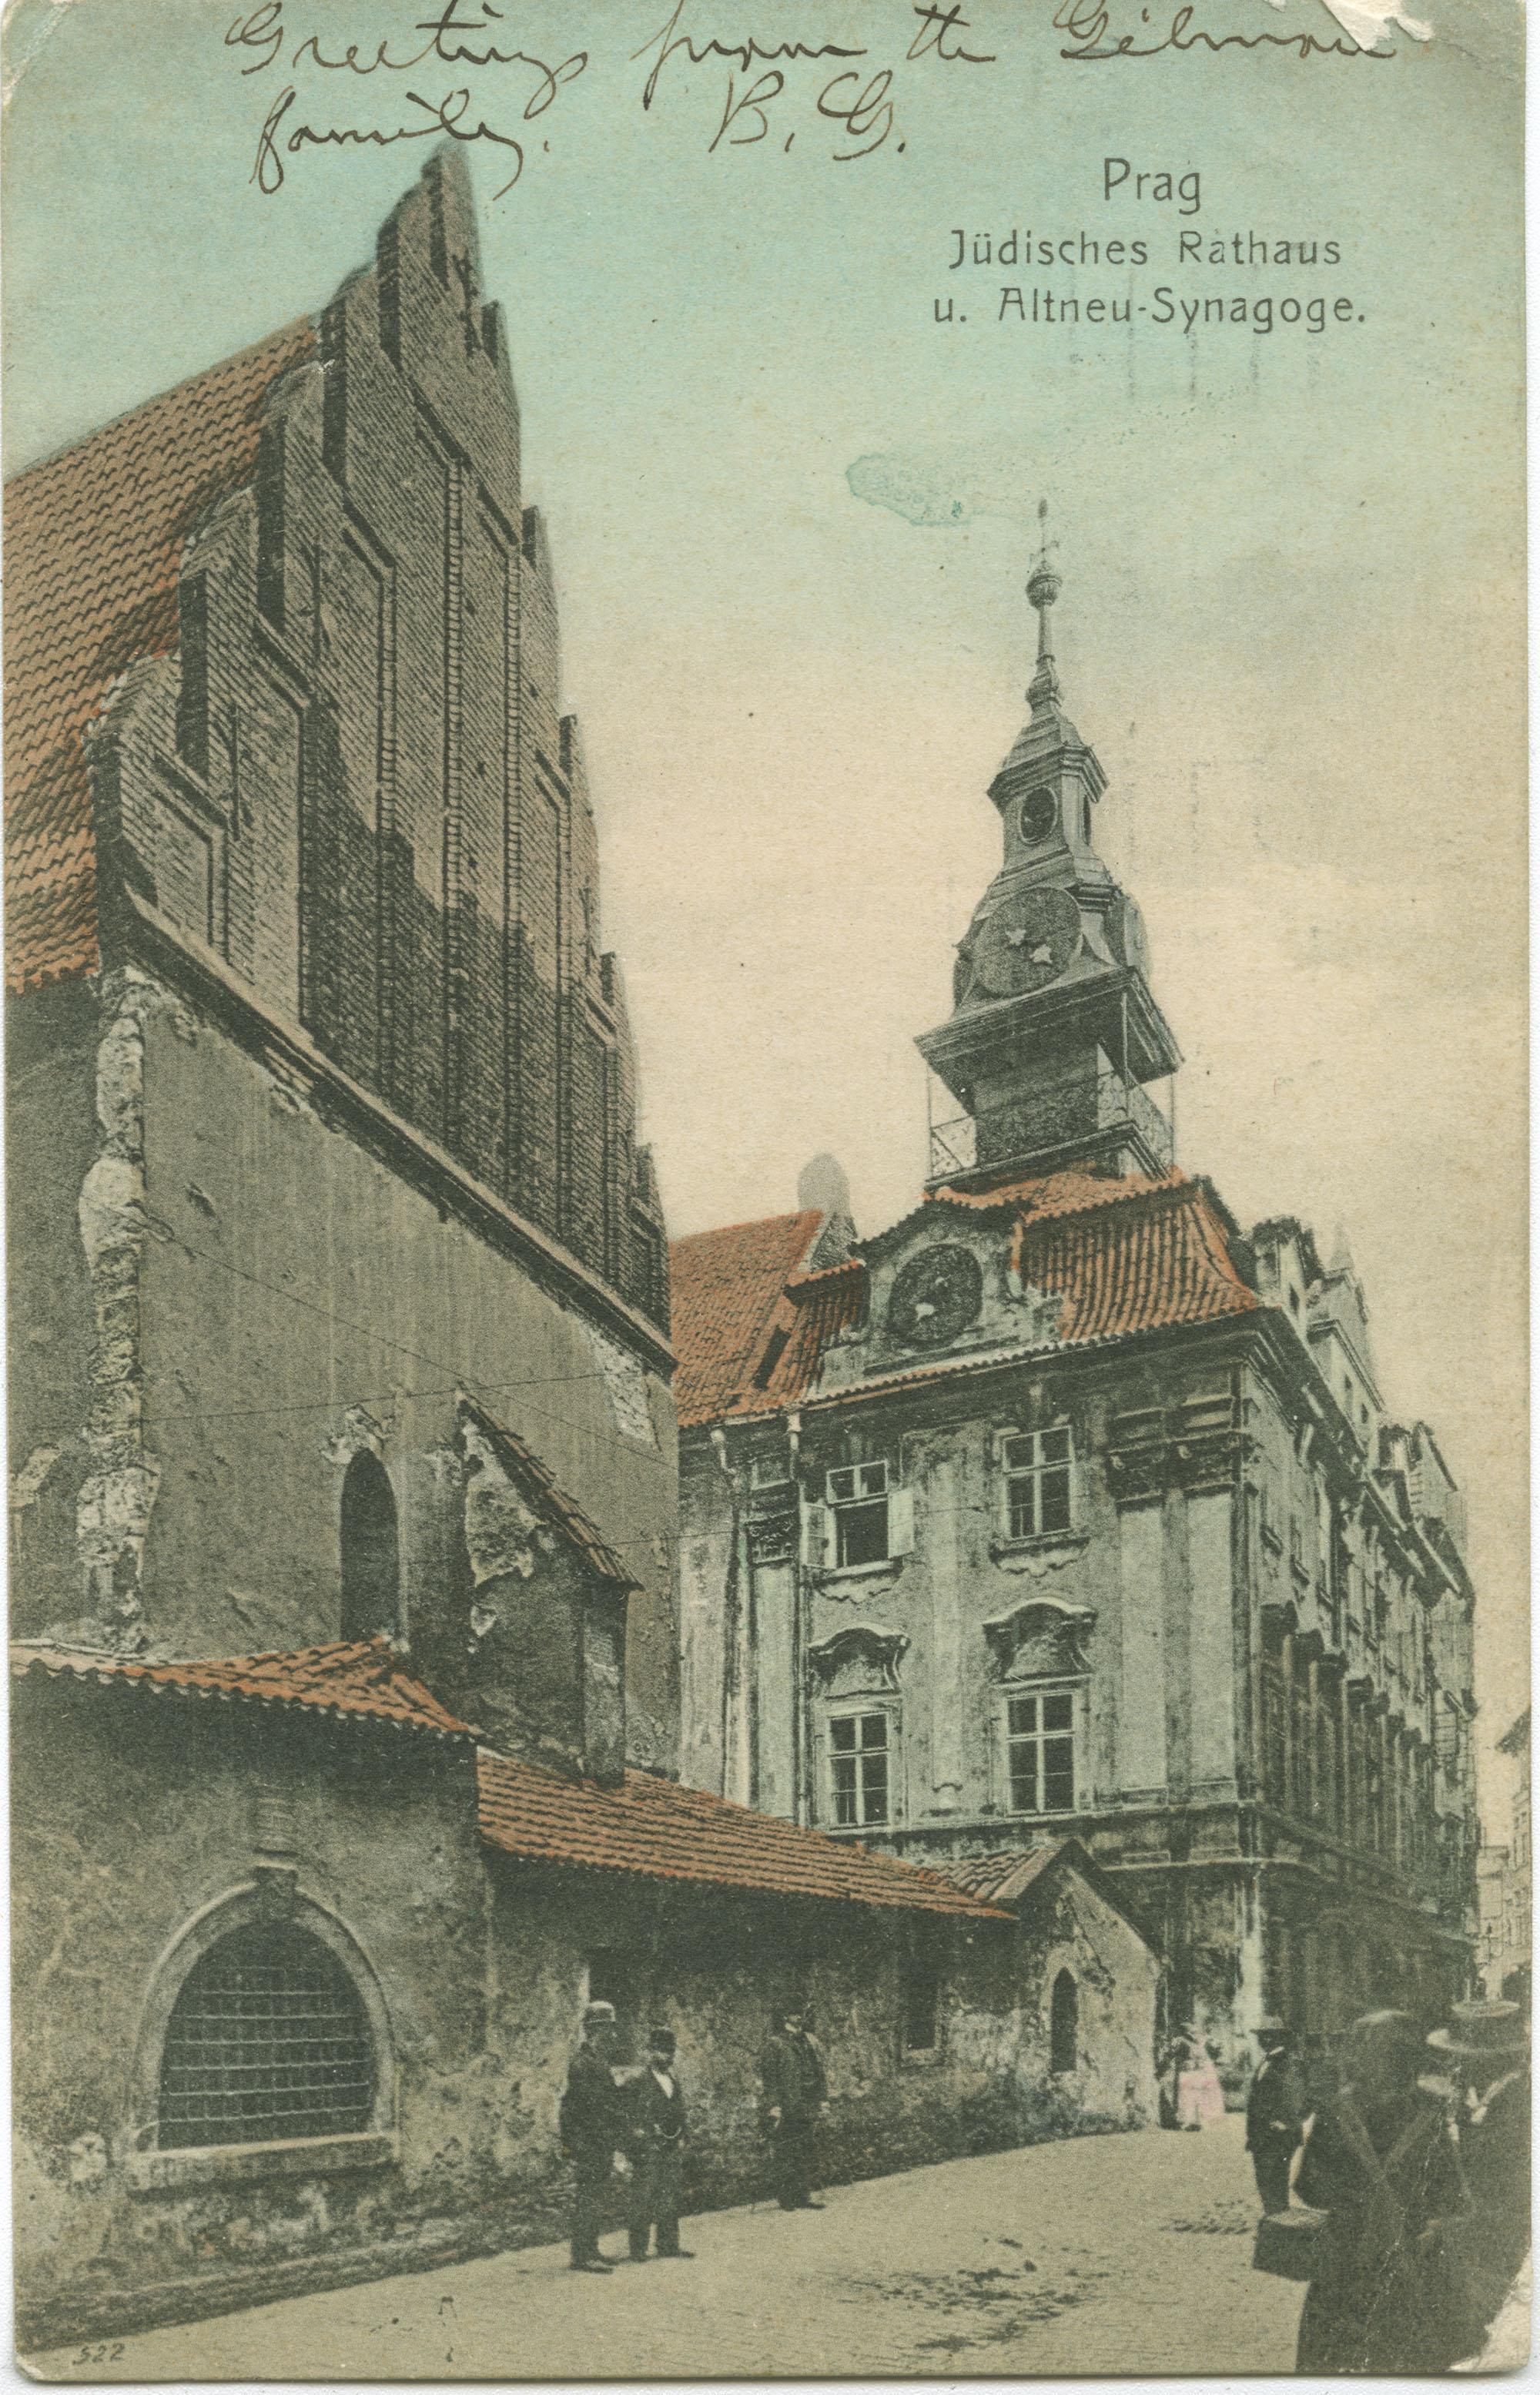 Prag Jüdisches Rathaus u. Altneu-Synagoge.